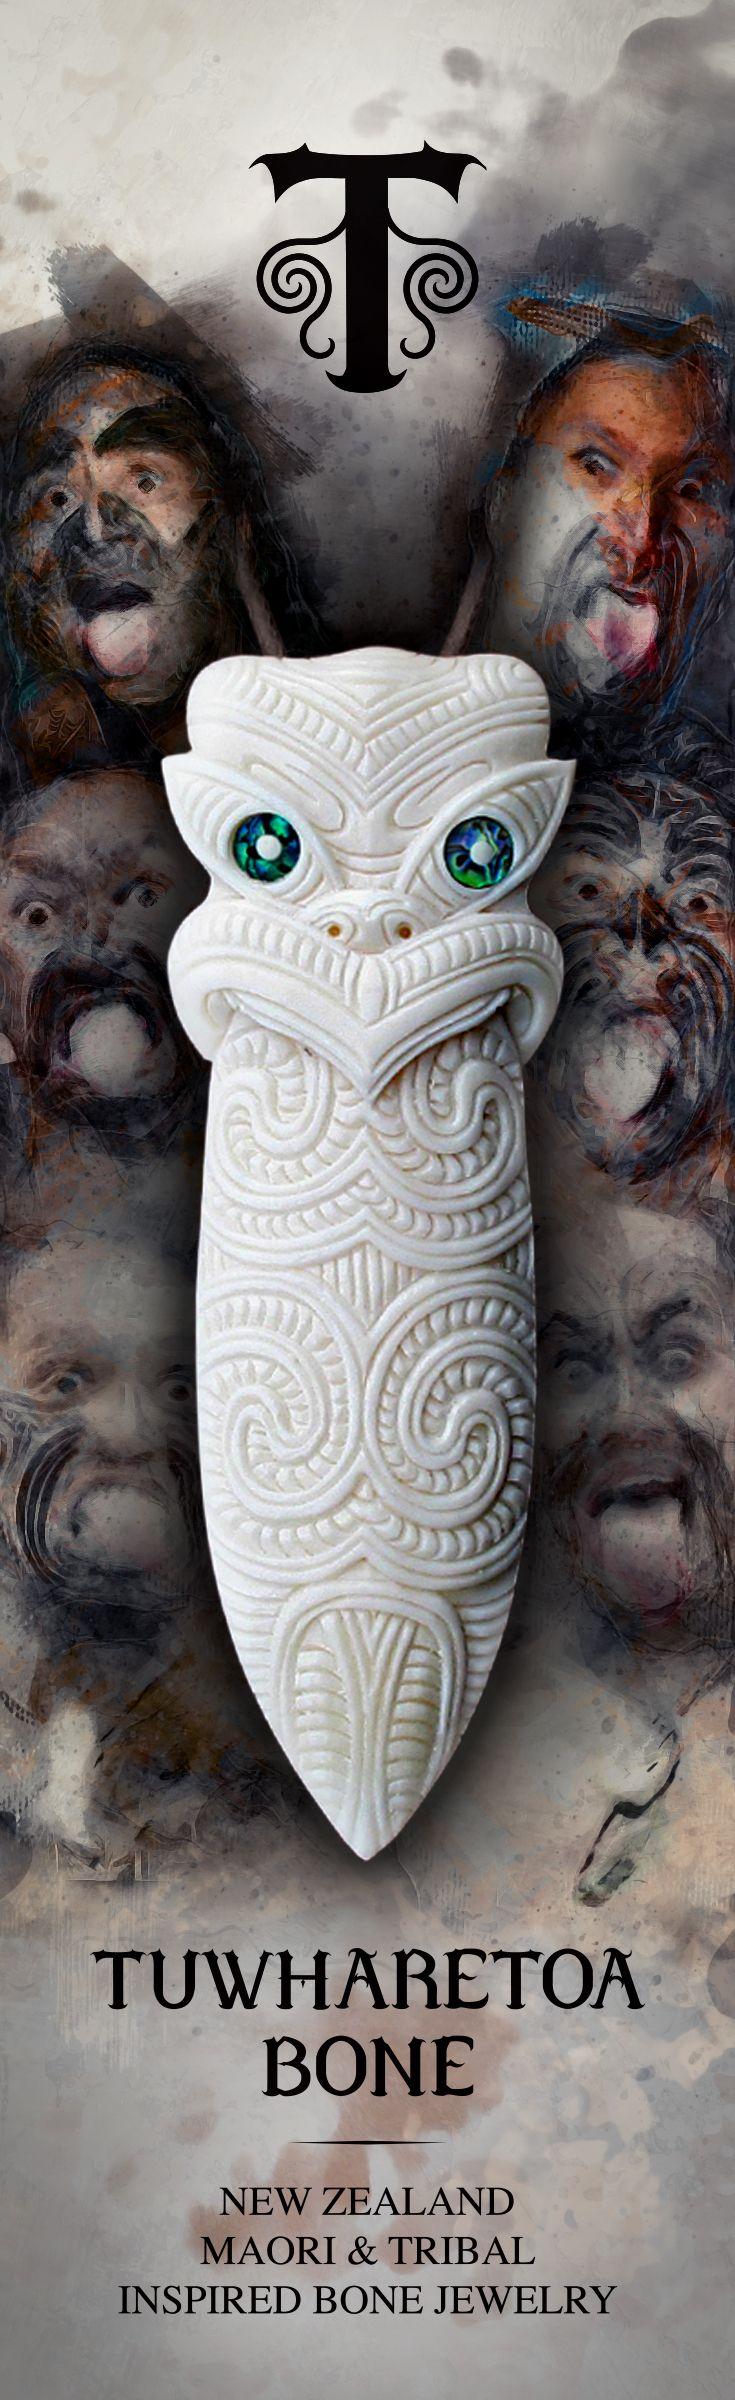 Best maori art ideas on pinterest culture meaning